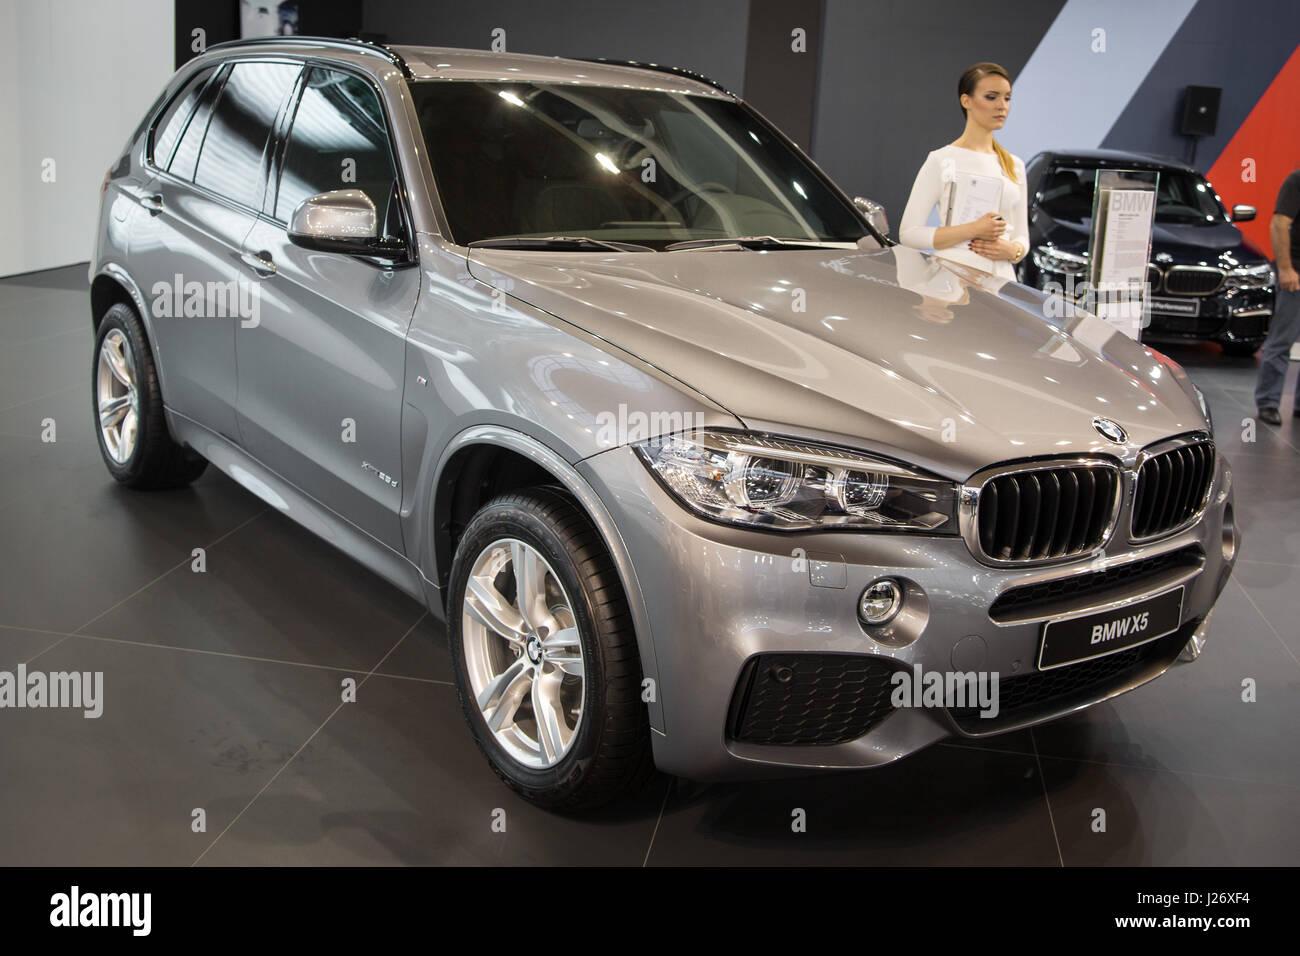 Belgrade, Serbia - March 23, 2017: New BMW X5 presented at Belgrade 53th International Motor Show - MSA (OICA). - Stock Image